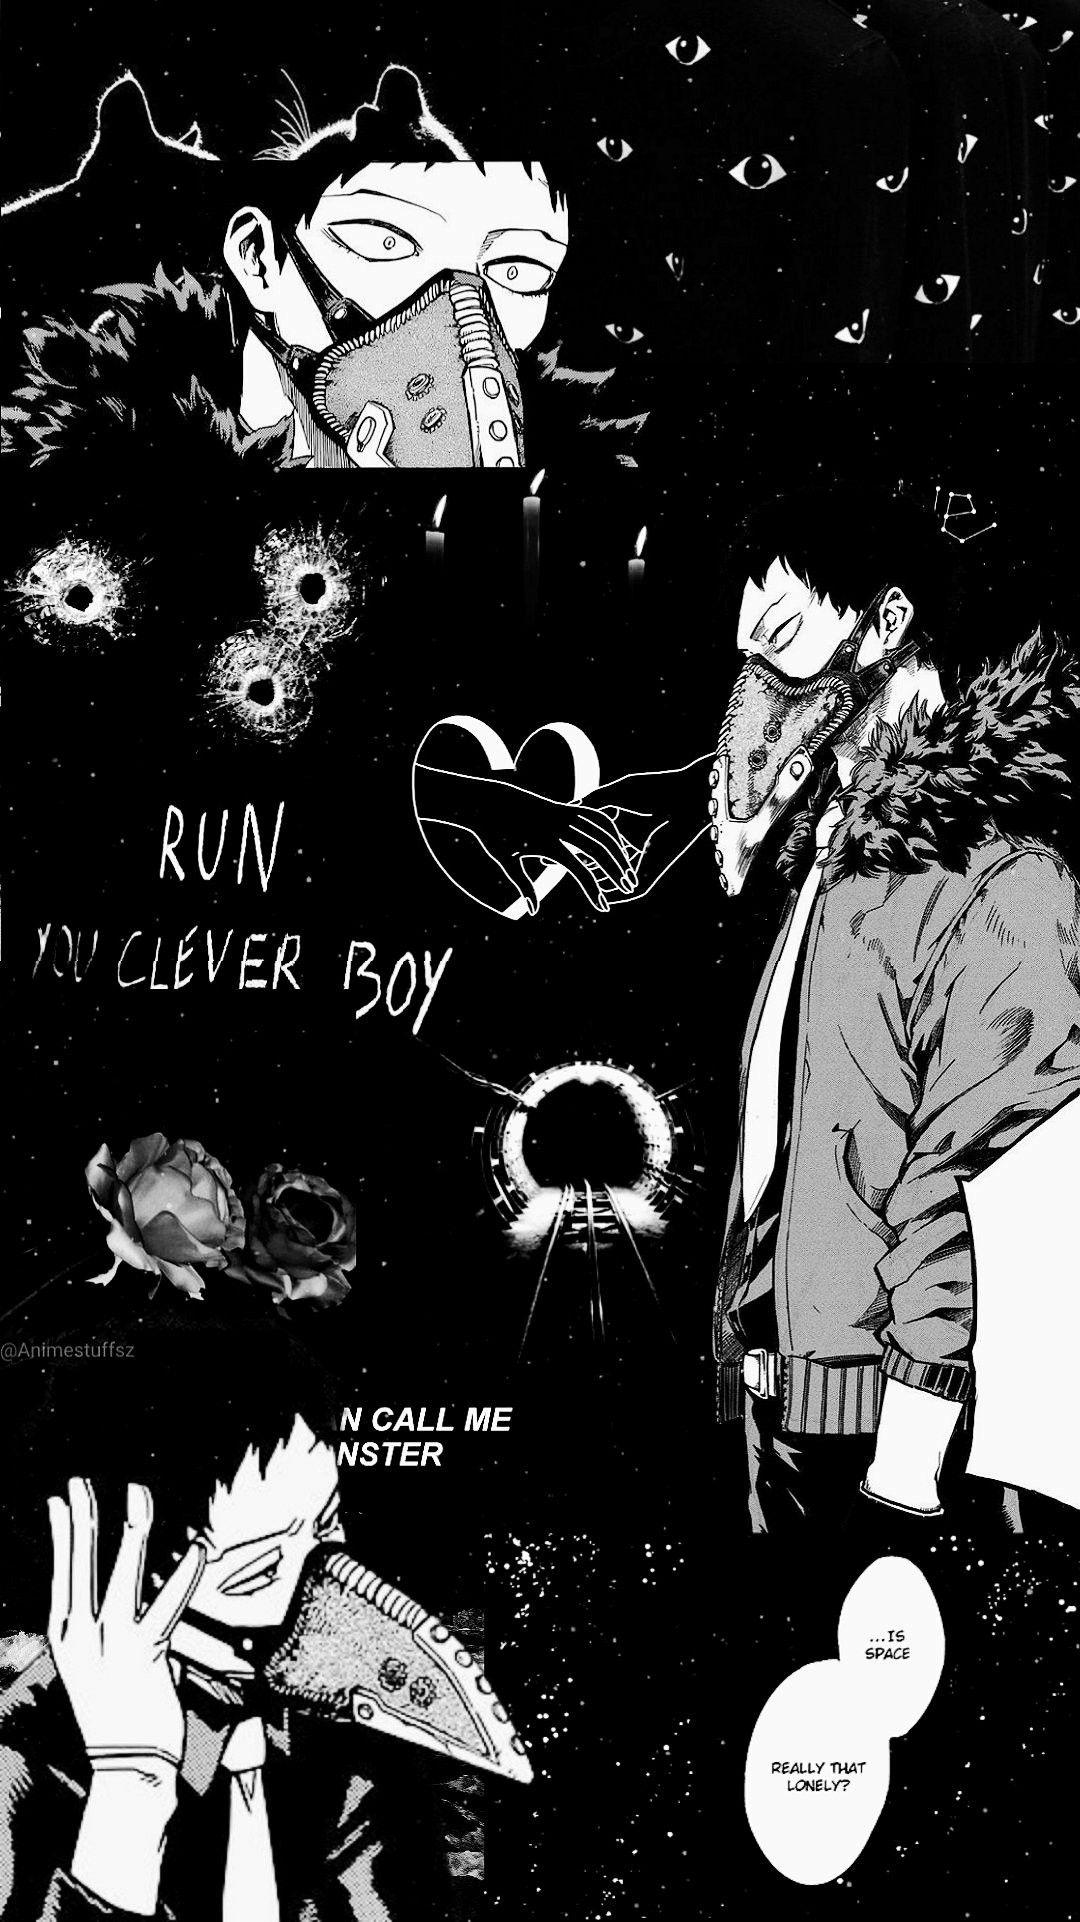 Overhaul Anime Wallpaper Anime Wallpaper Iphone Anime Wallpaper Phone